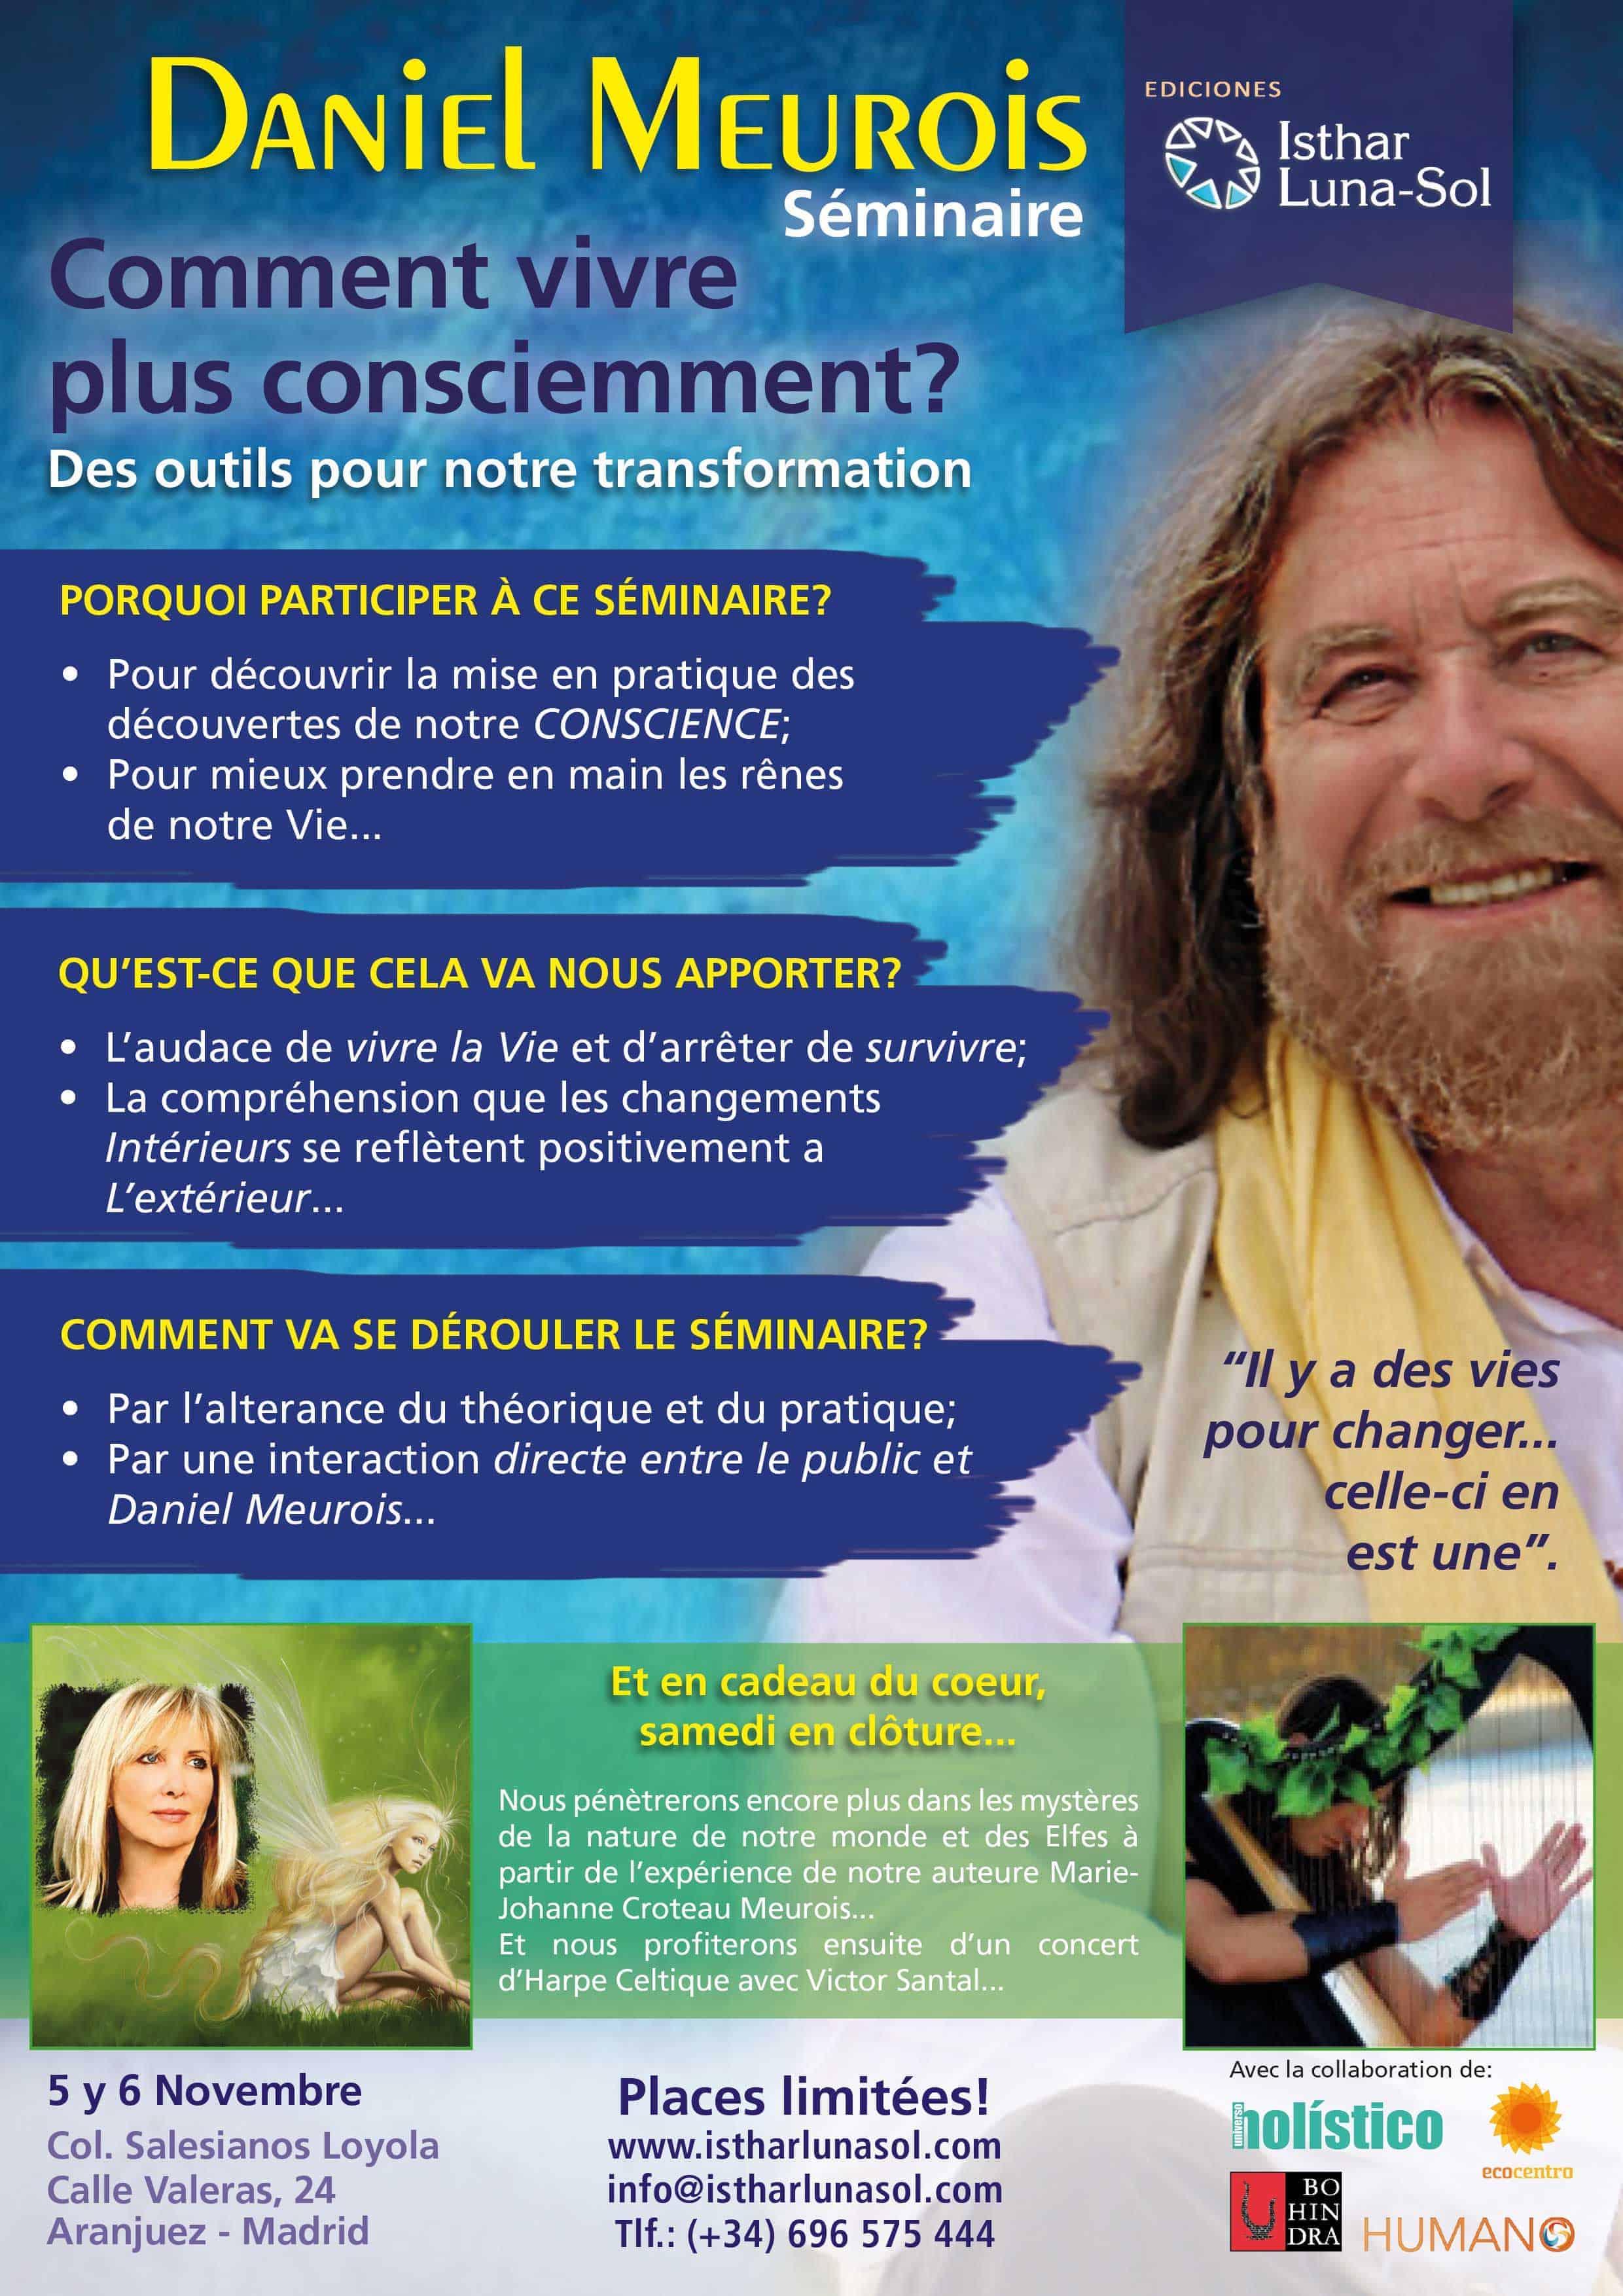 sem2016_img_web_2016_frances2